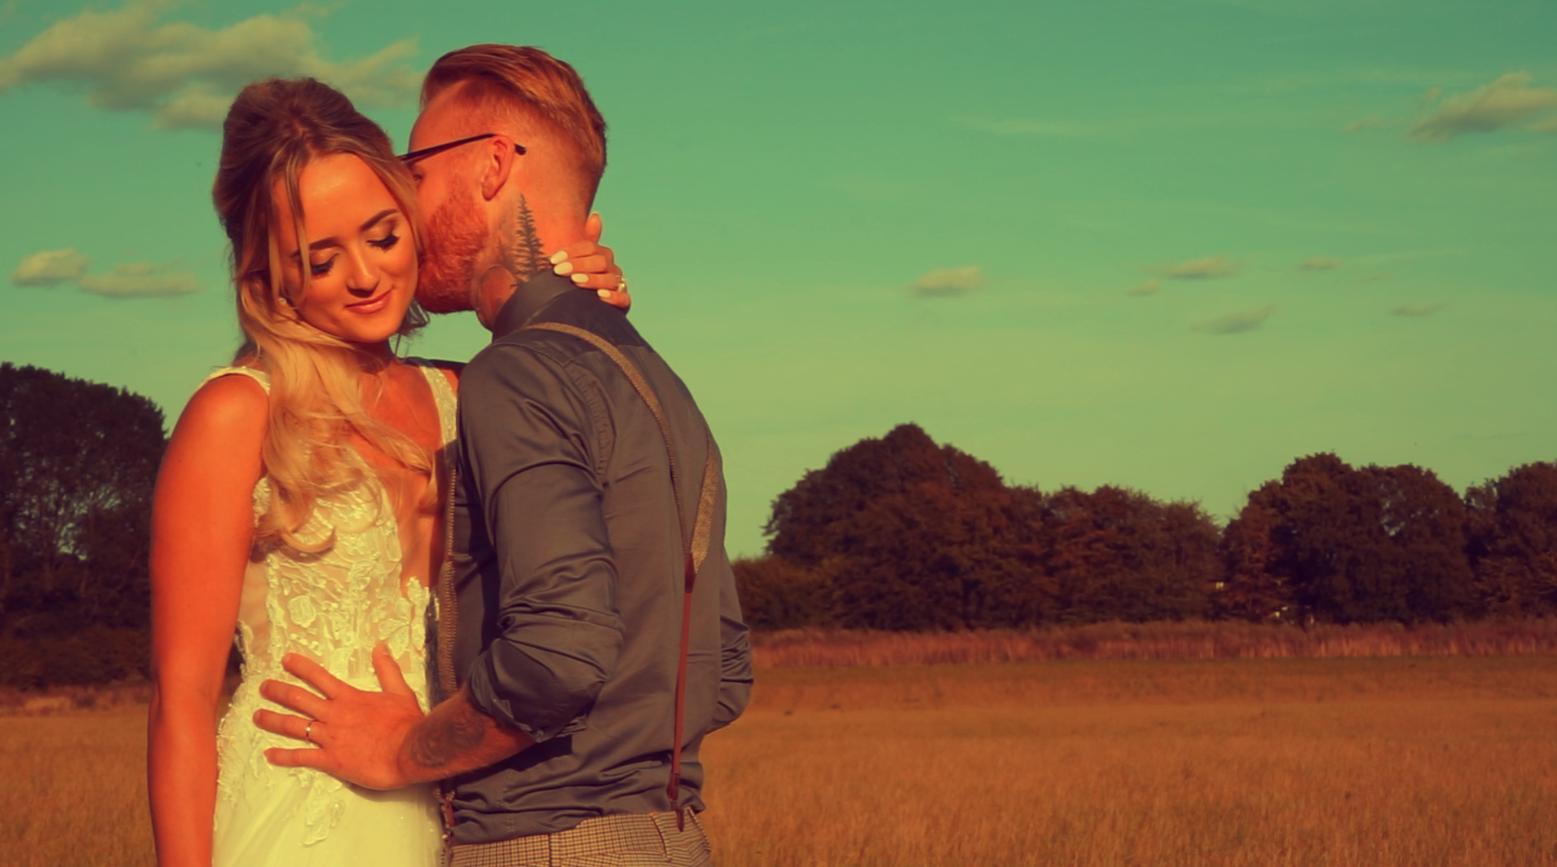 Wedding videography Norfolk, Wedding Video Norfolk, Norfolk Wedding Videographer, videographer wedding, videography wedding, Norfolk Videographer, videographer wedding near me, Suffolk wedding videographer